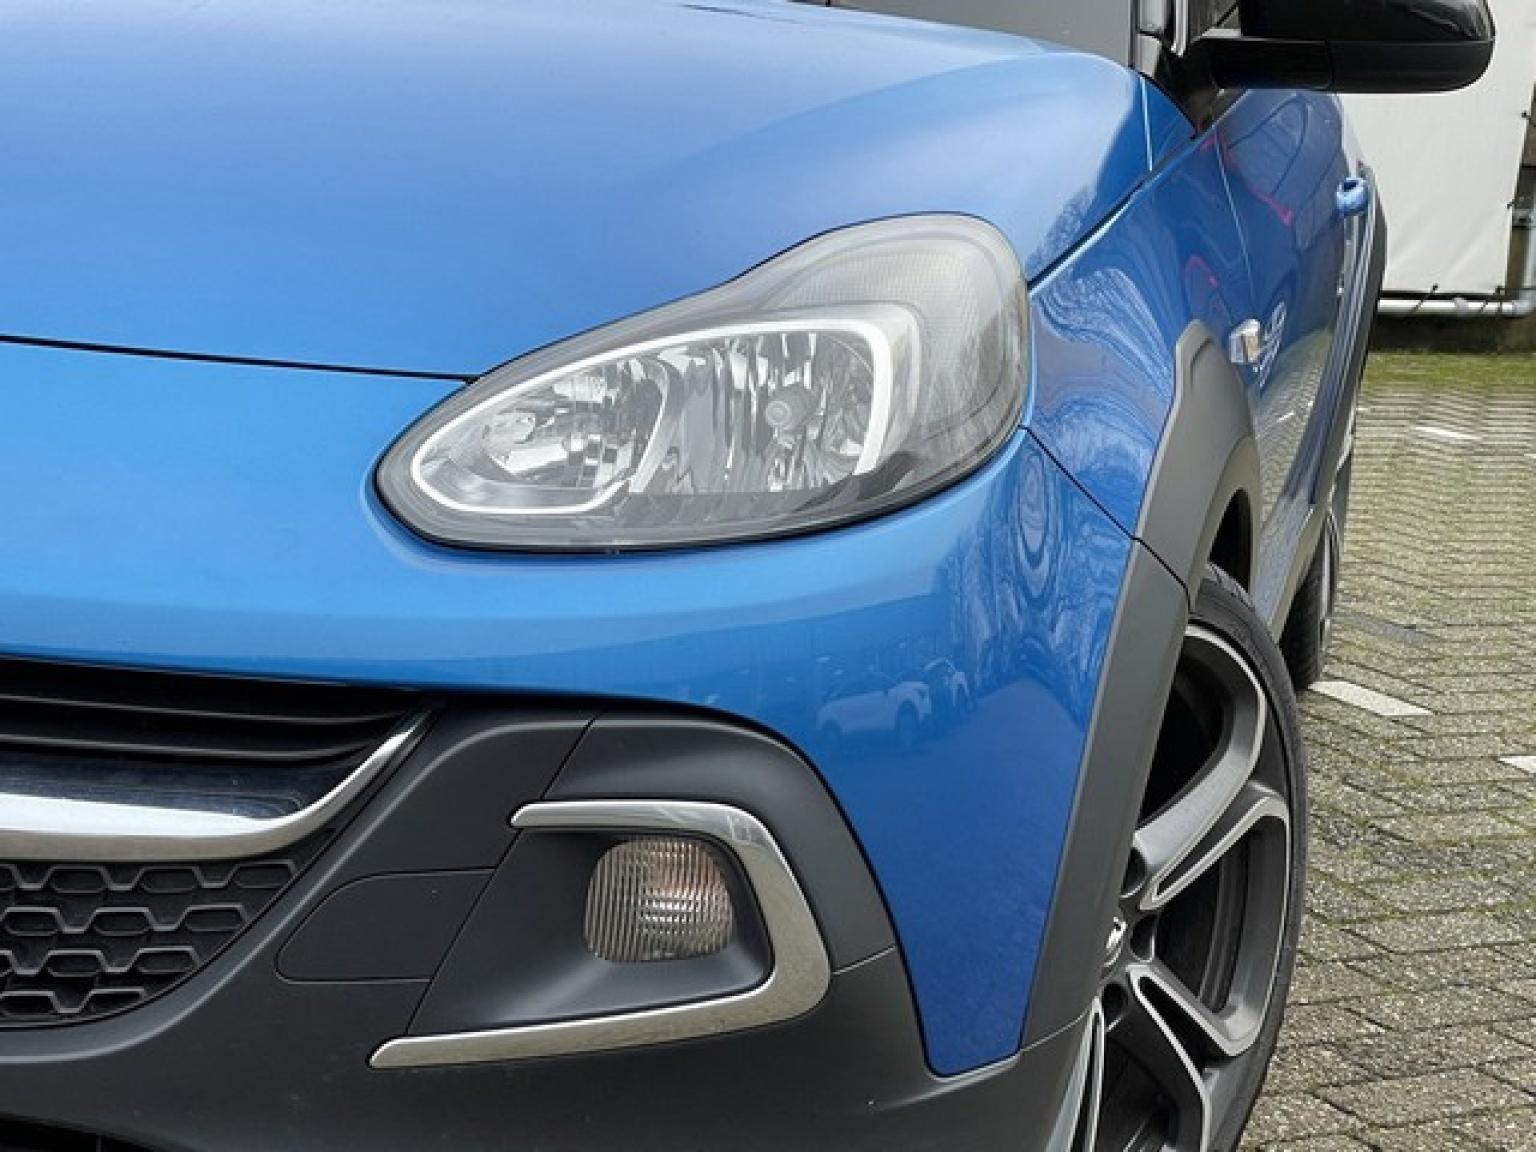 Opel-Adam S-23